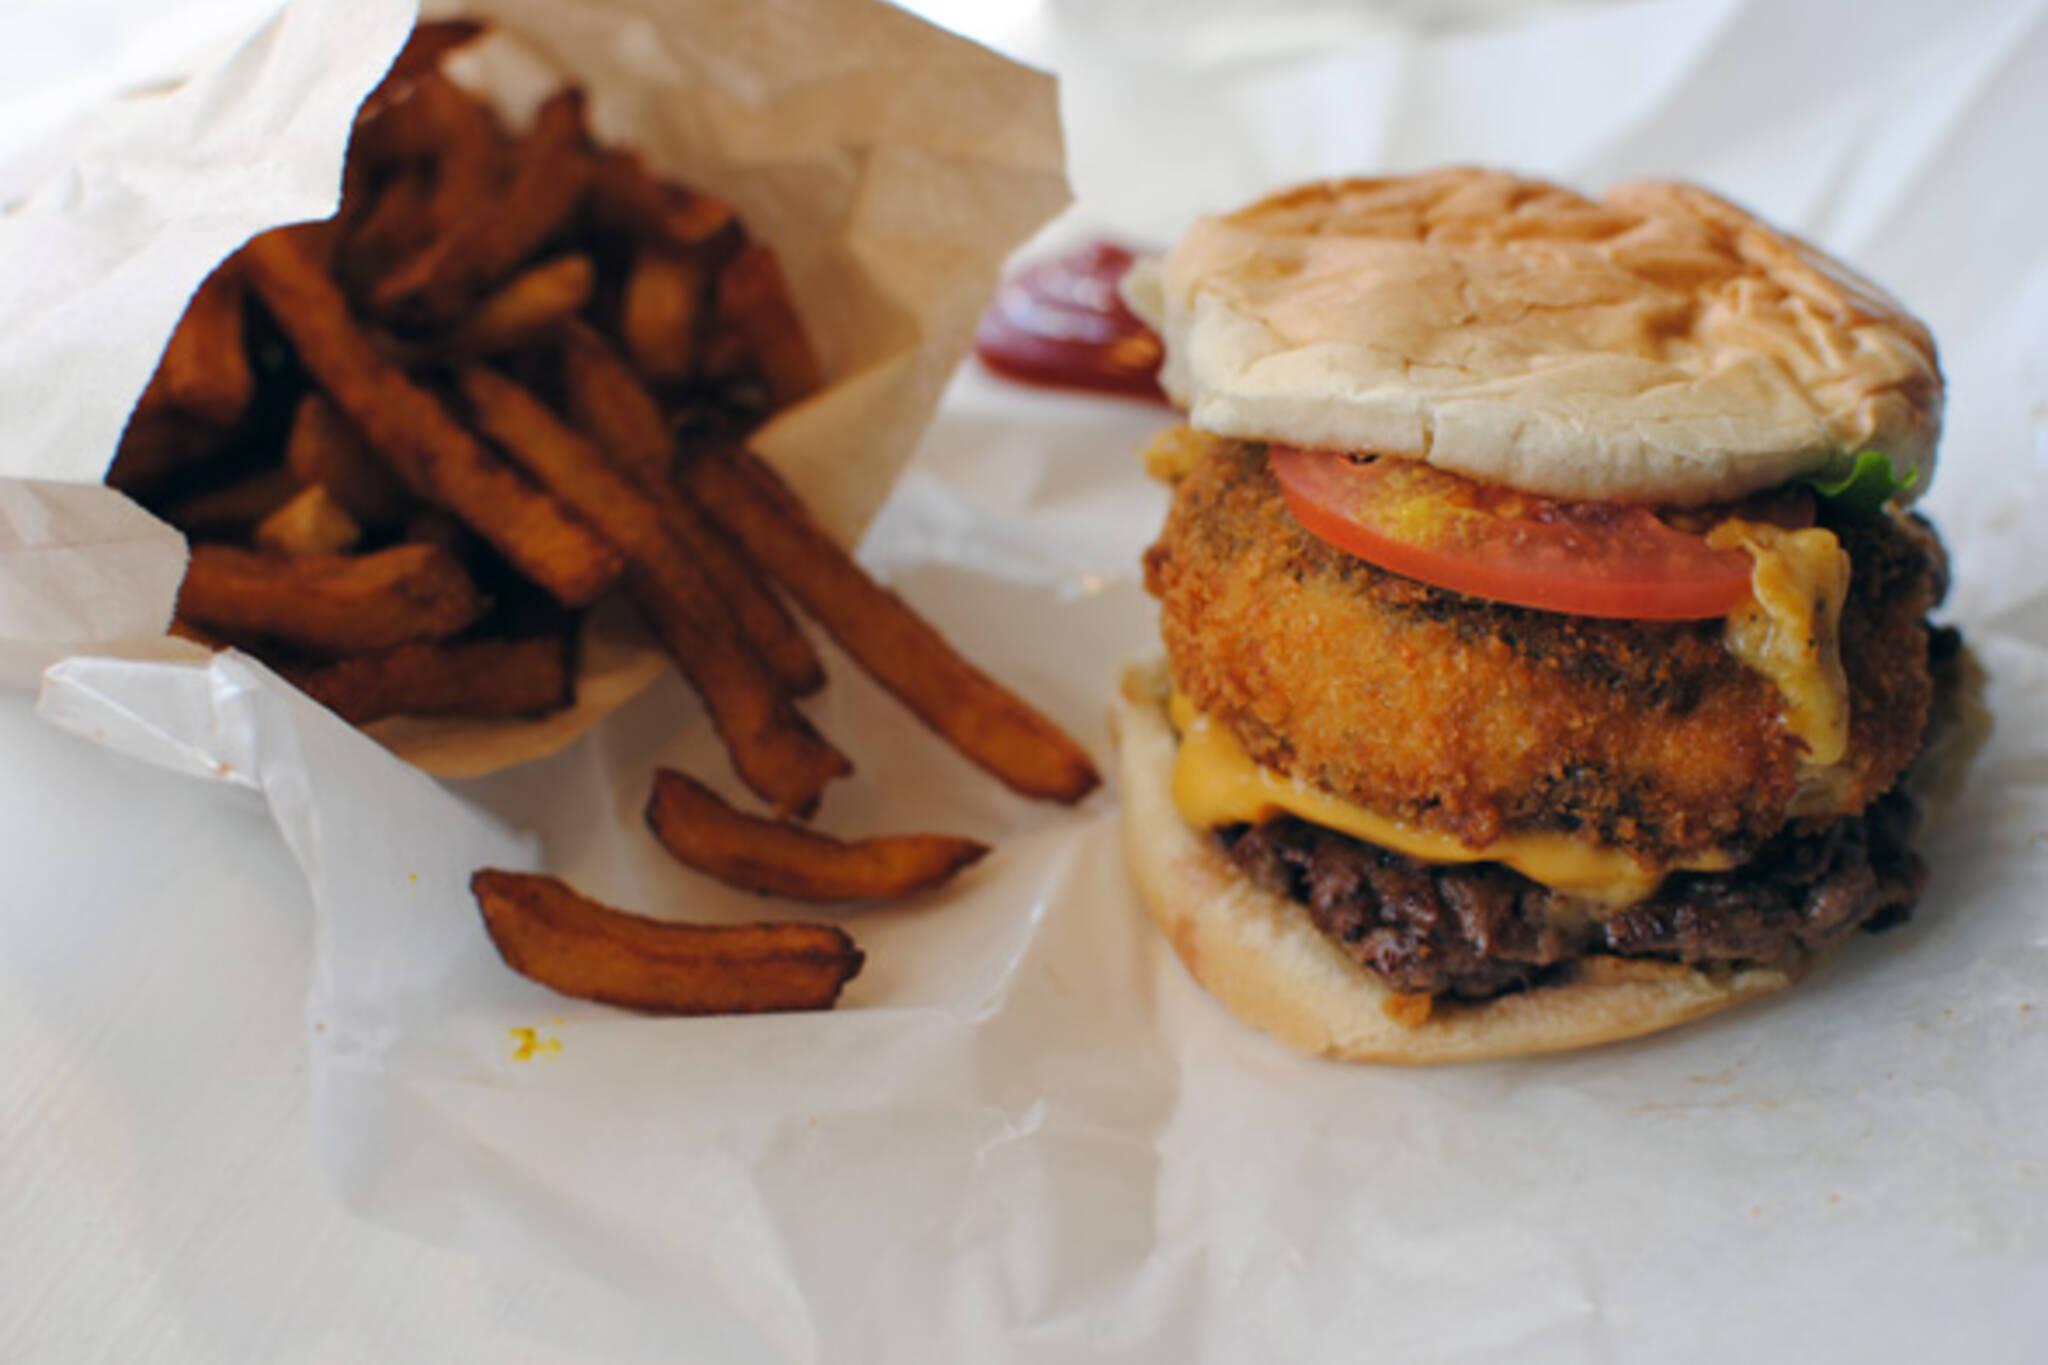 Burger's Preist Yonge Street